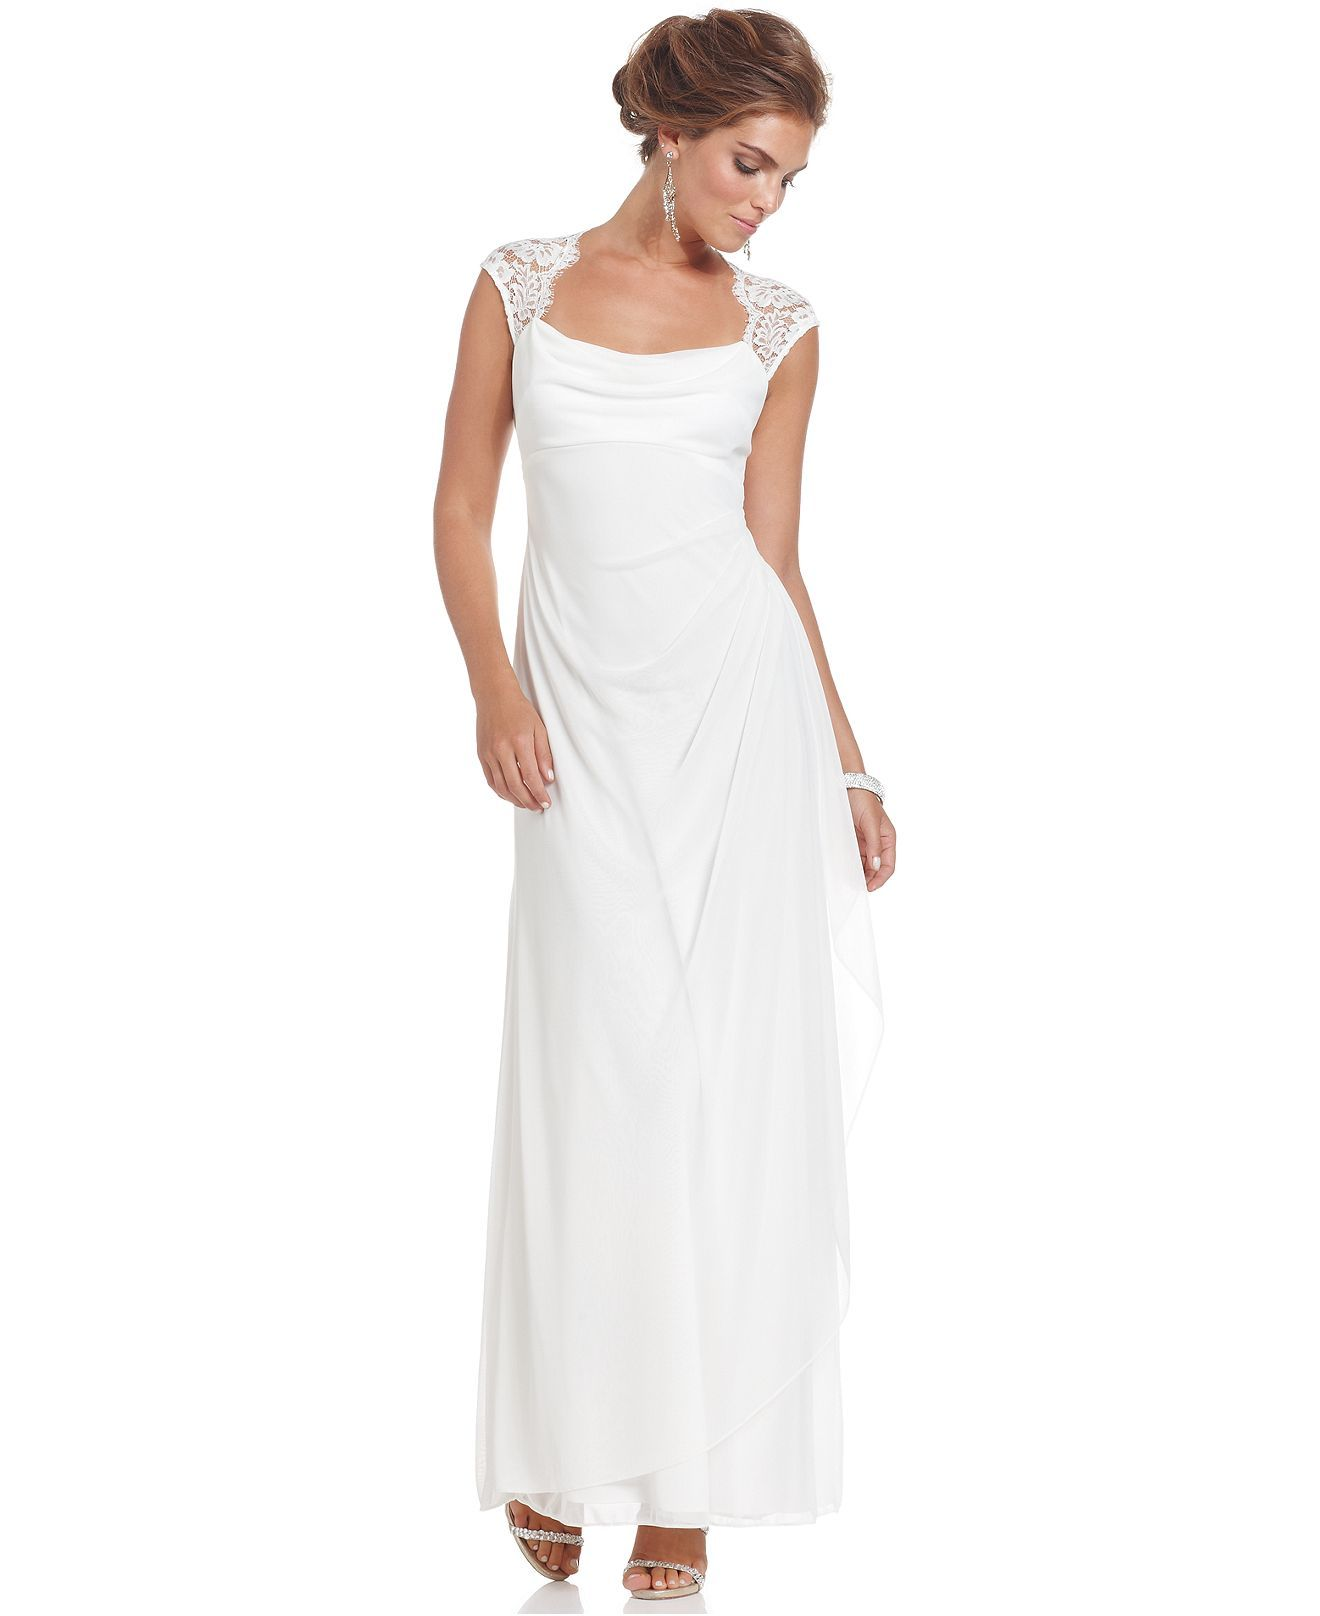 Xscape dress cap sleeve lace evening gown bridal dresses xscape dress cap sleeve lace evening gown bridal dresses women macys ombrellifo Gallery